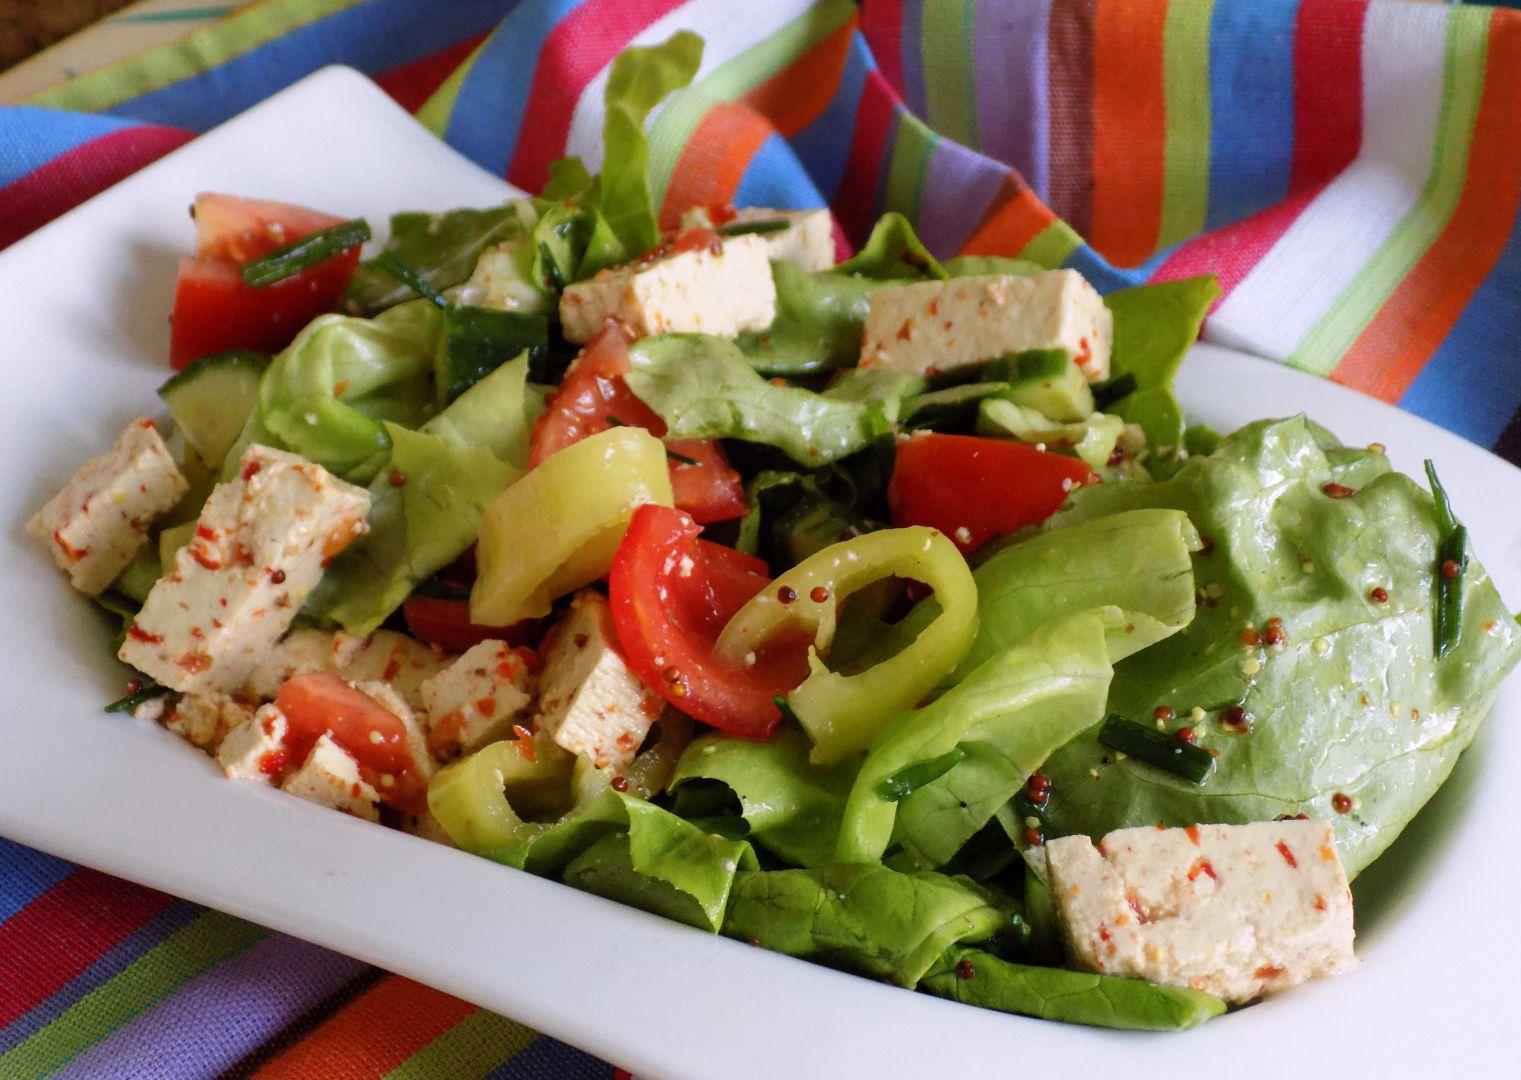 Zeleninový salát s tofu chilli recept